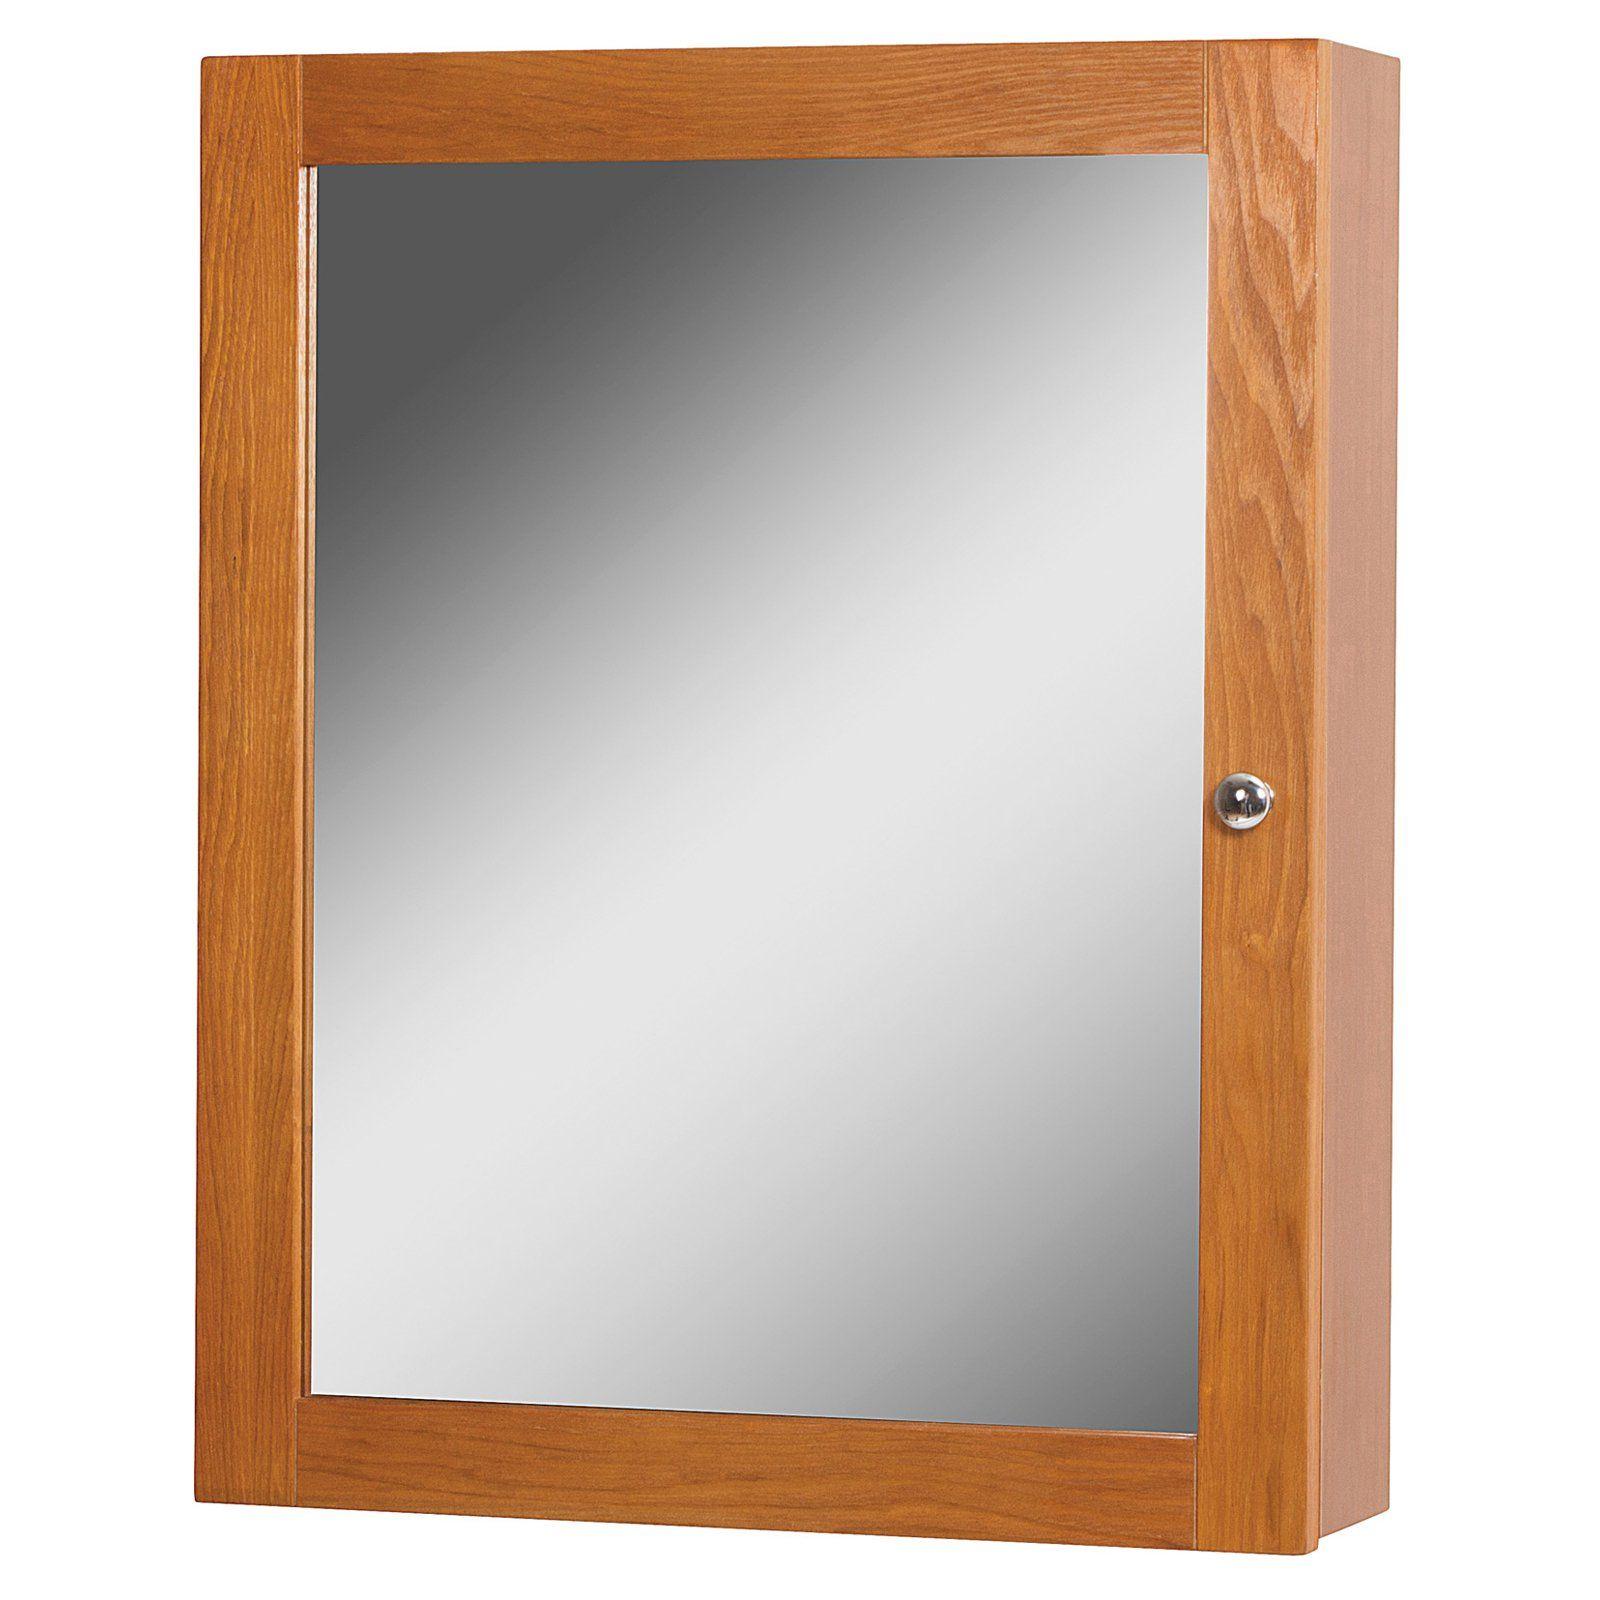 Foremost Worthington Bathroom Medicine Cabinet Oak Bathroom